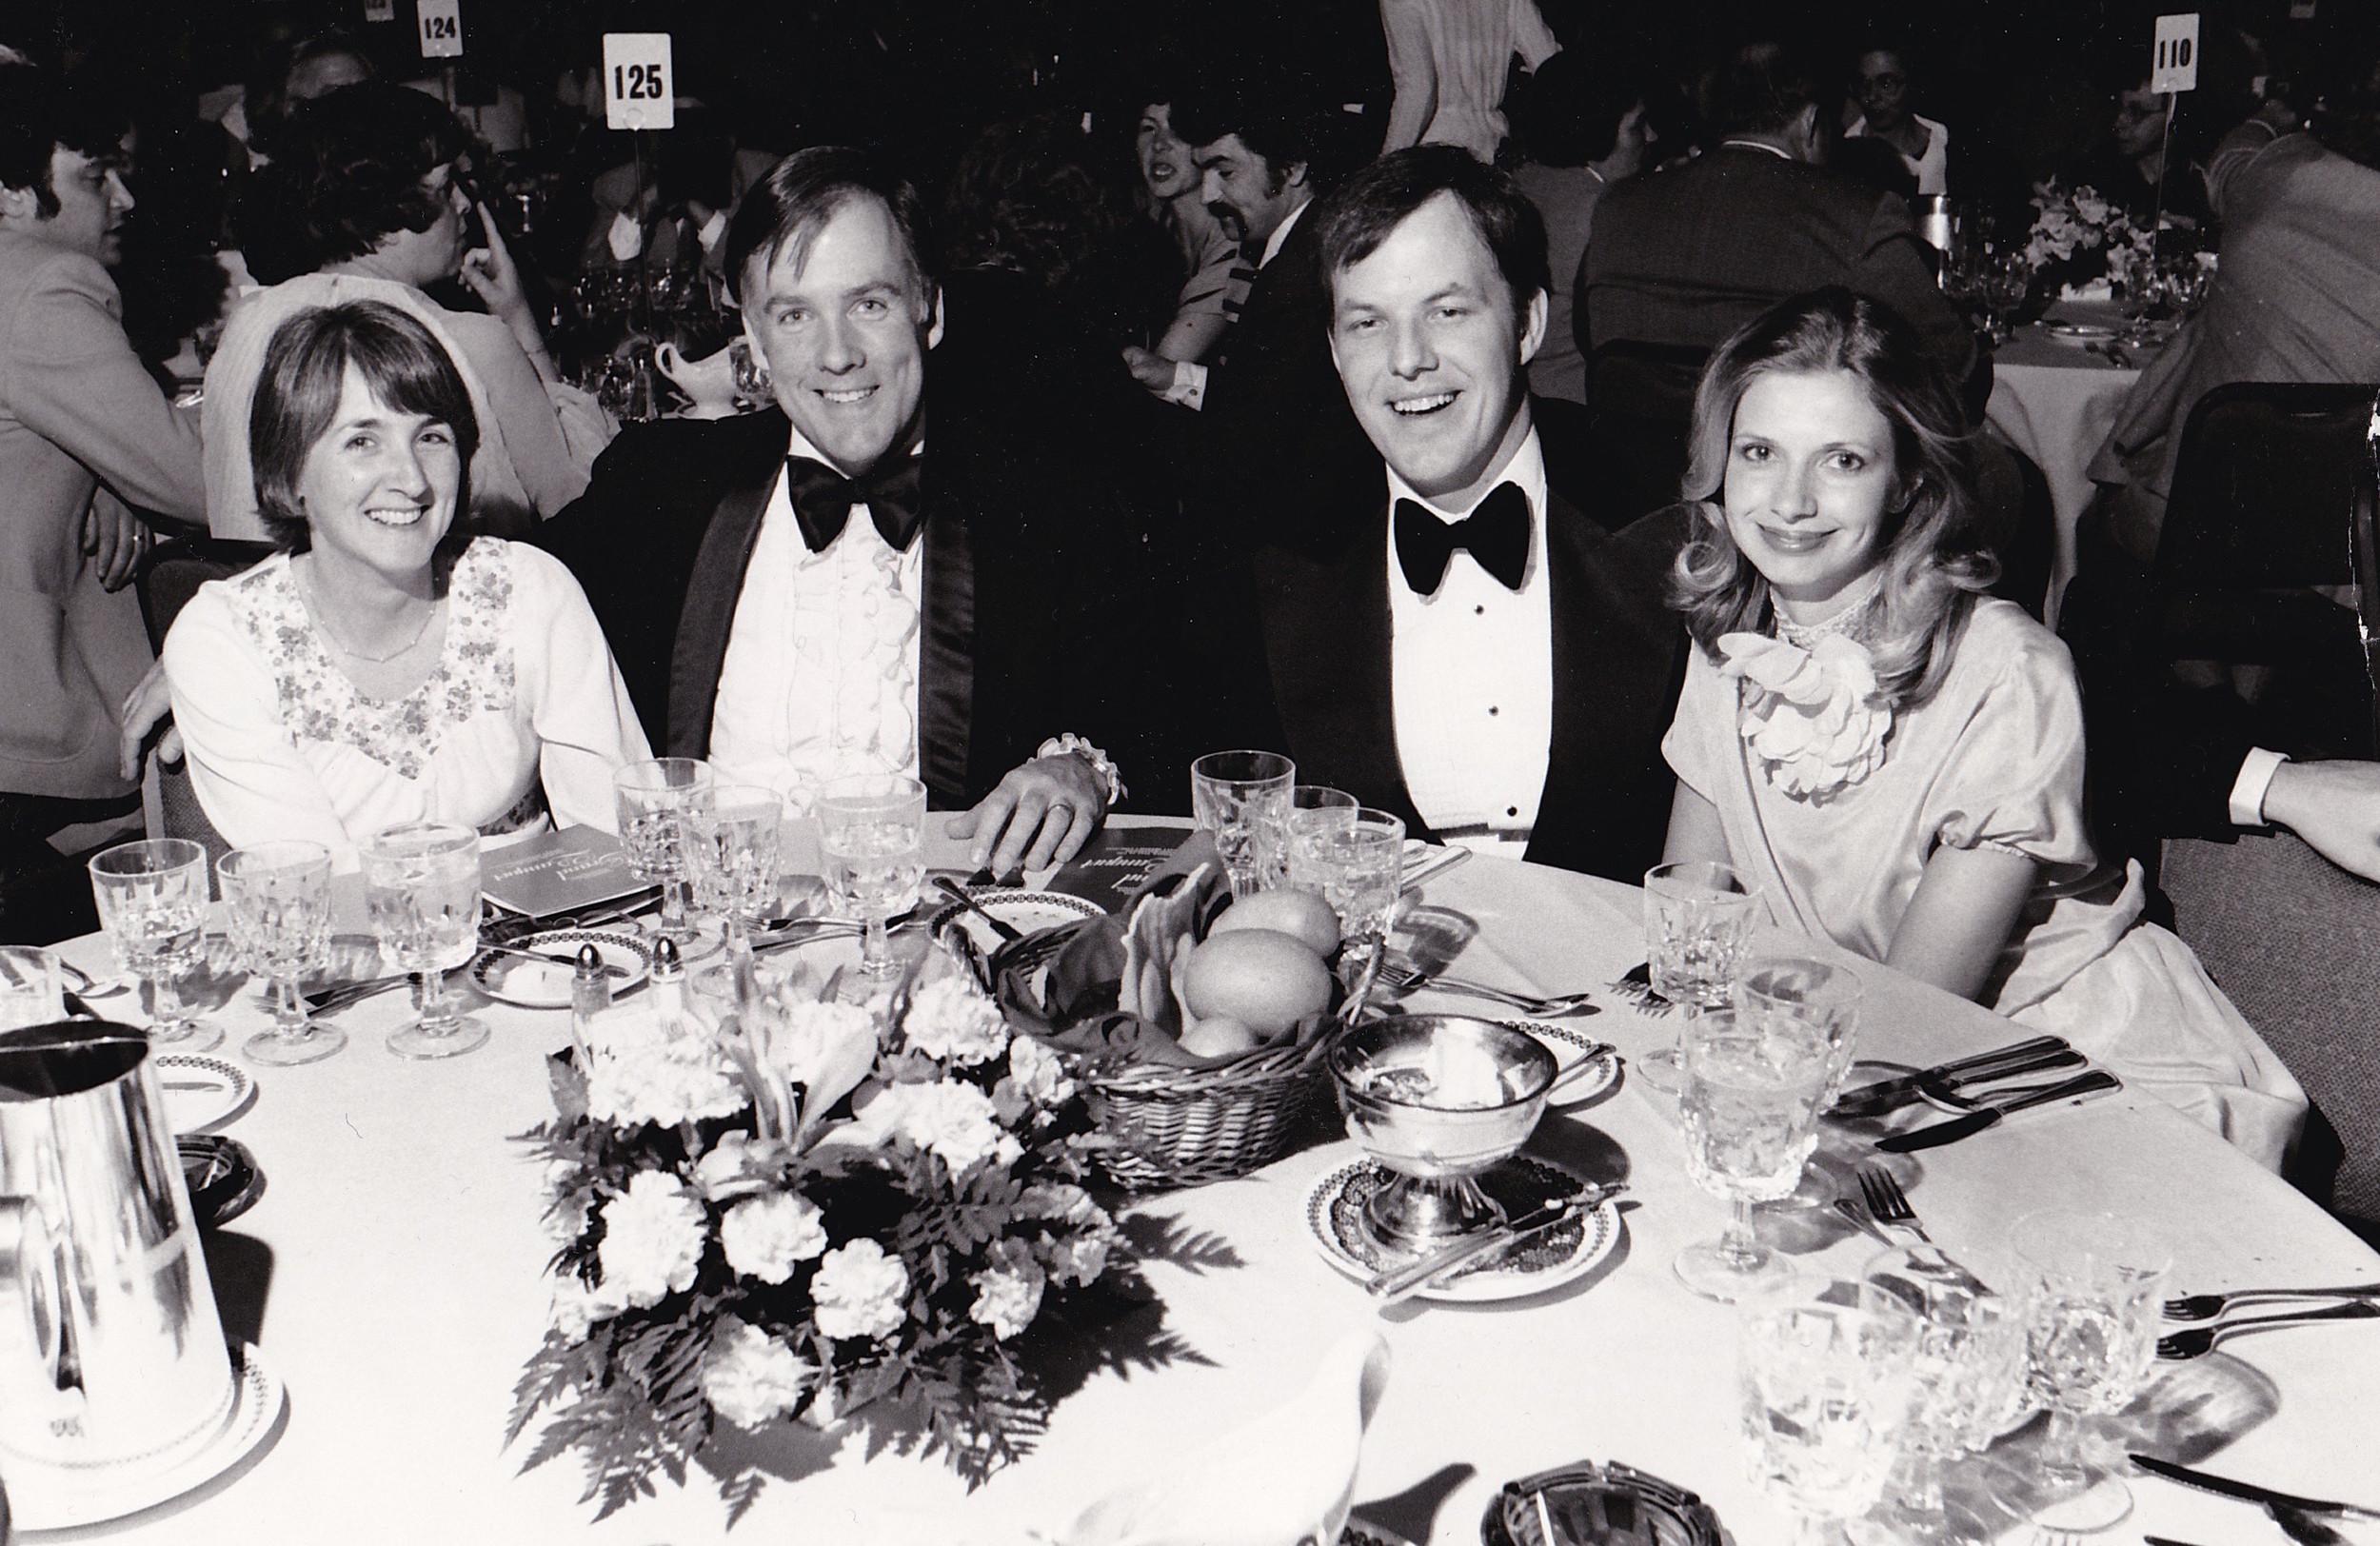 1985 National Restaurant Association show